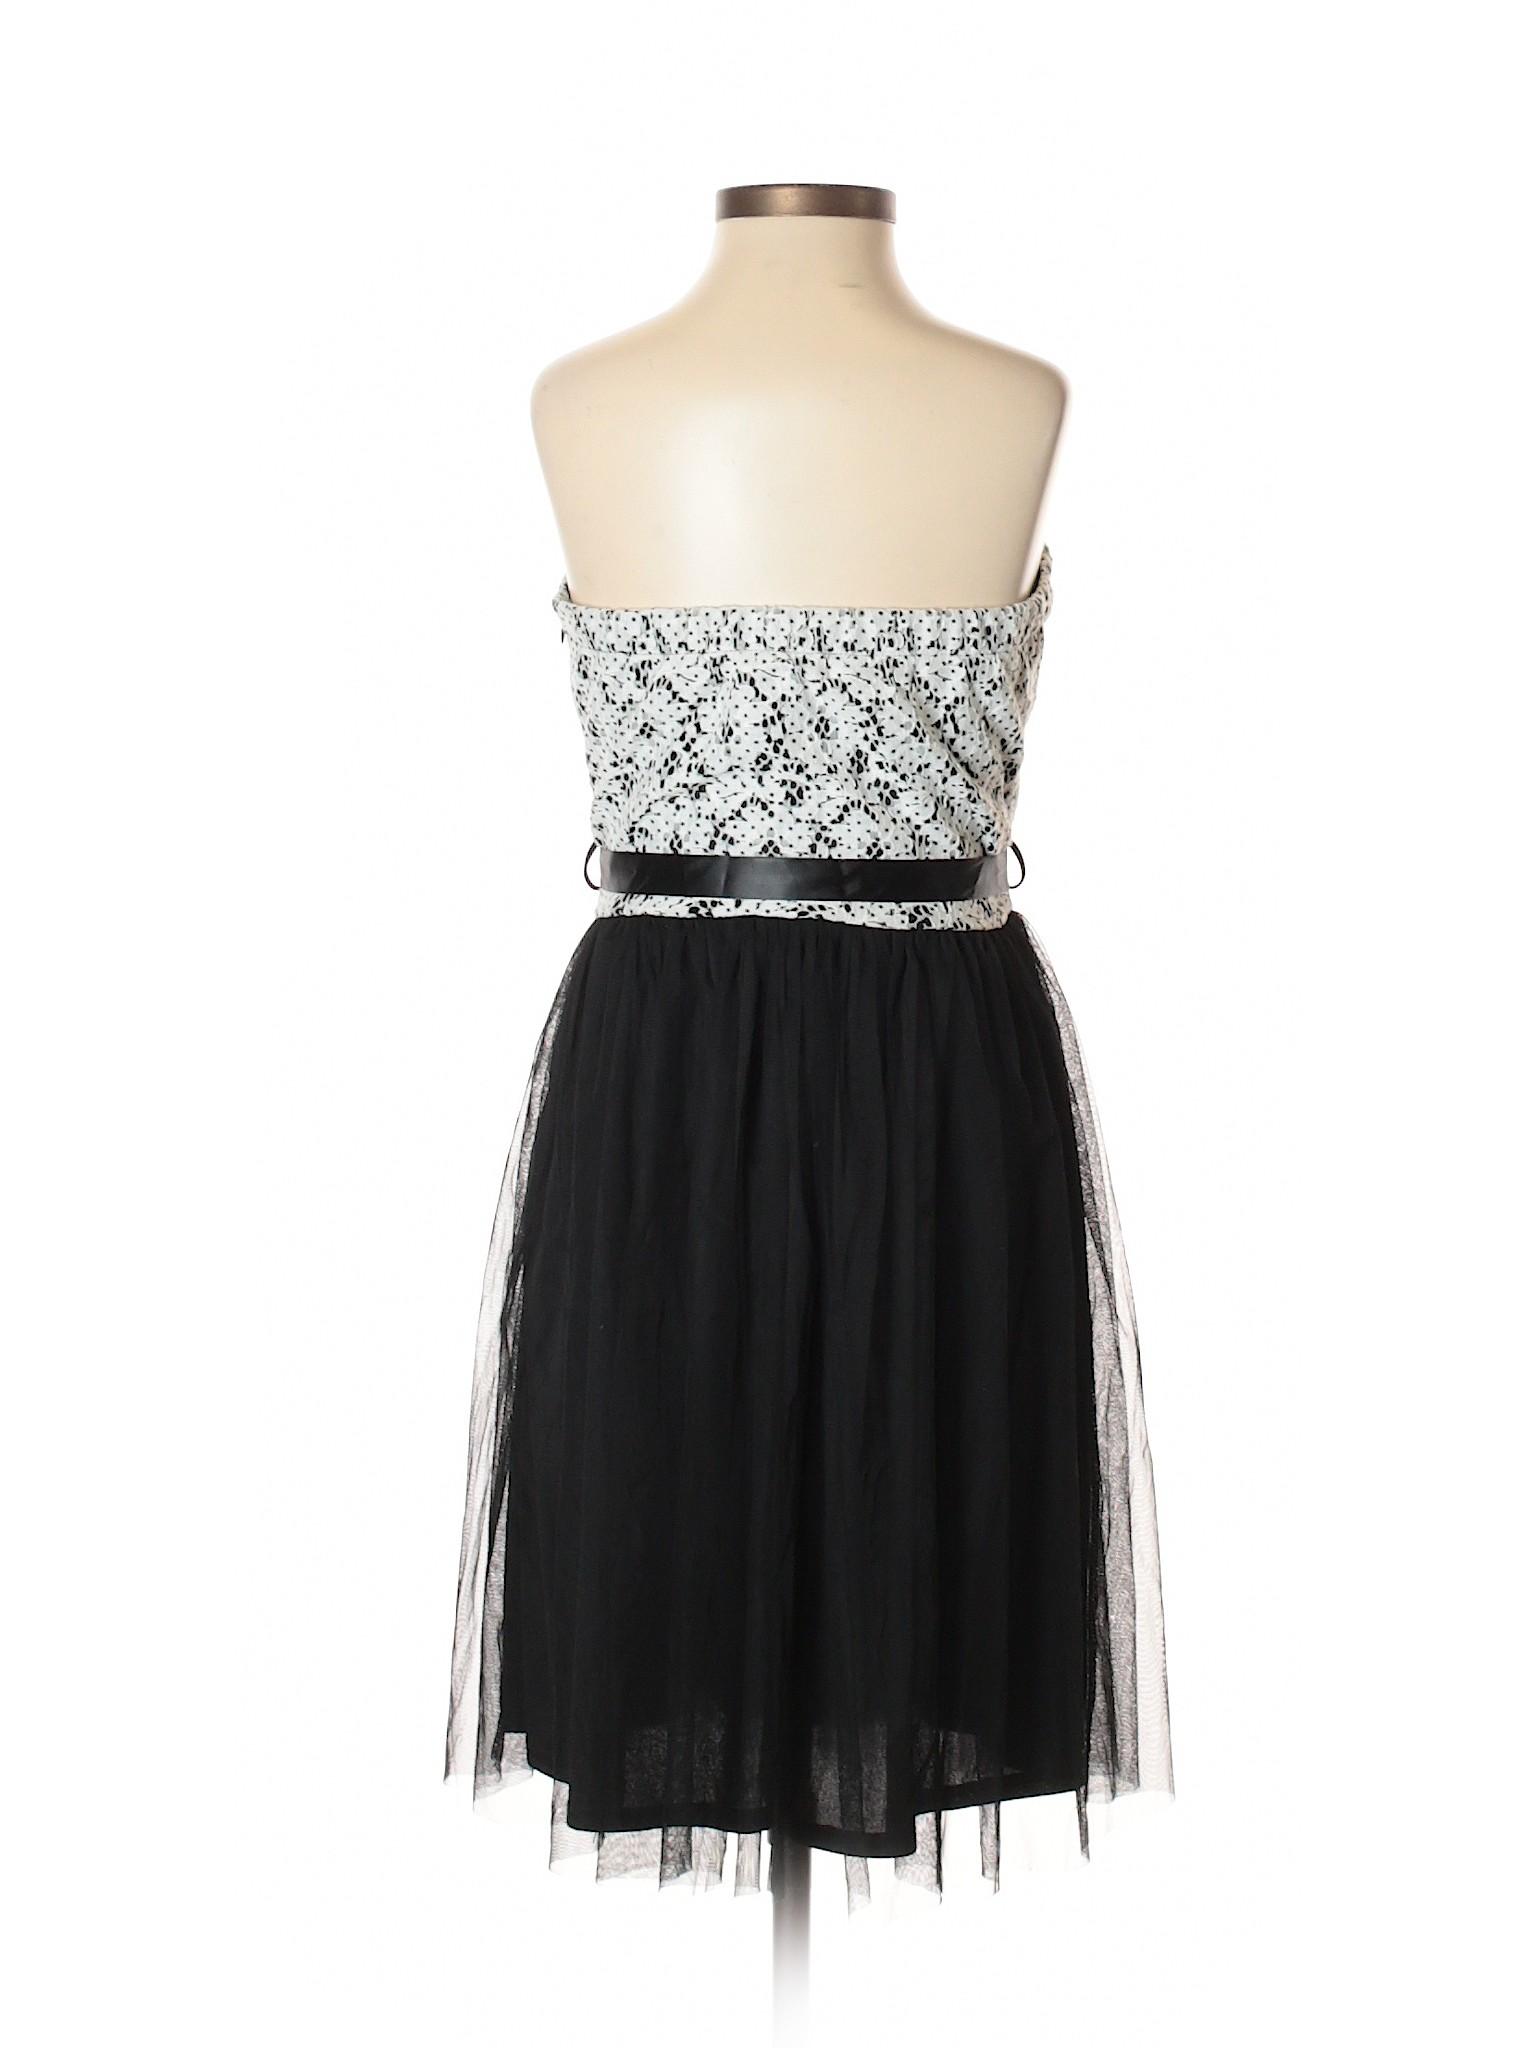 Casual winter Boutique Casual Dress Mystic winter Boutique Mystic Pf5TqT6w